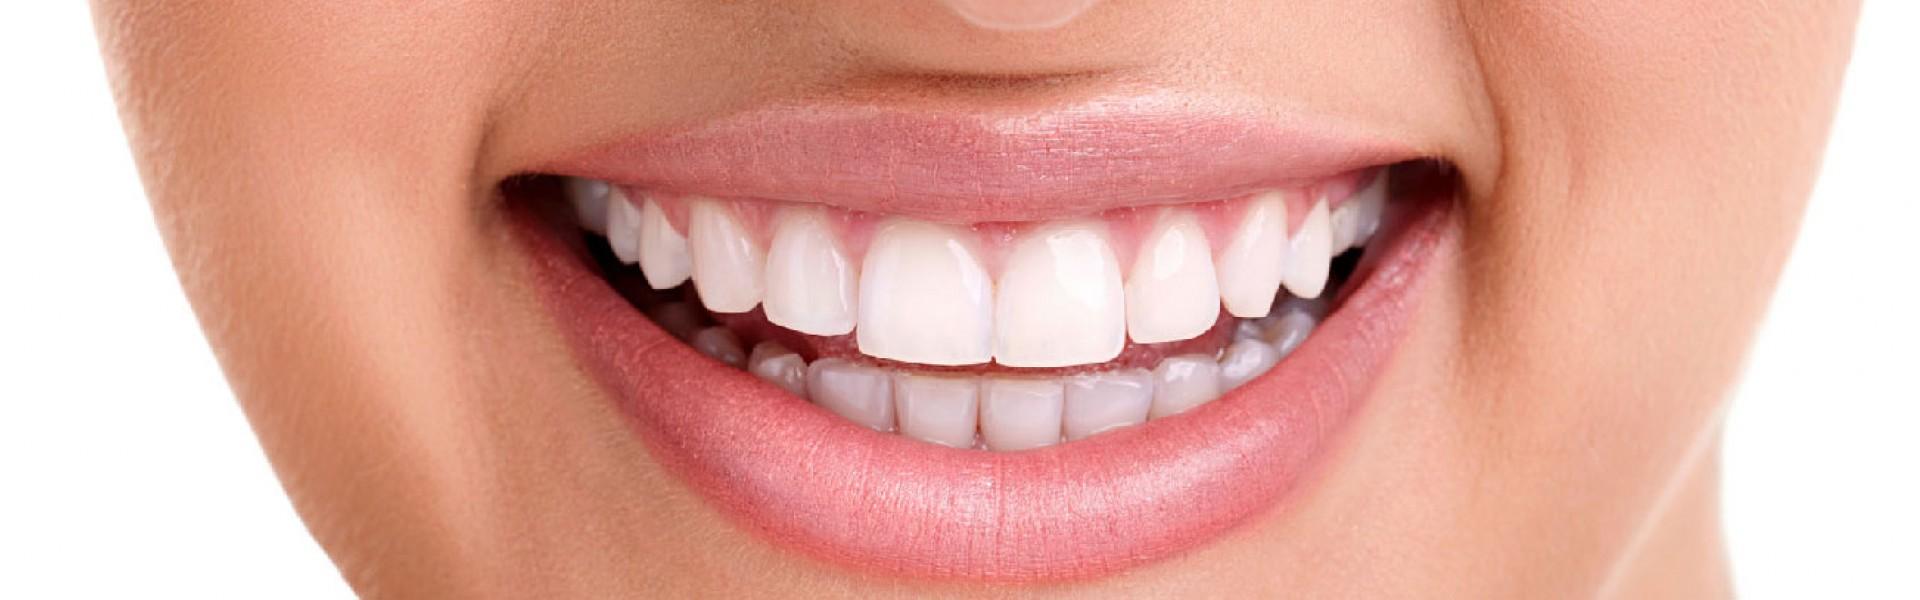 Self-ligating orthodontics